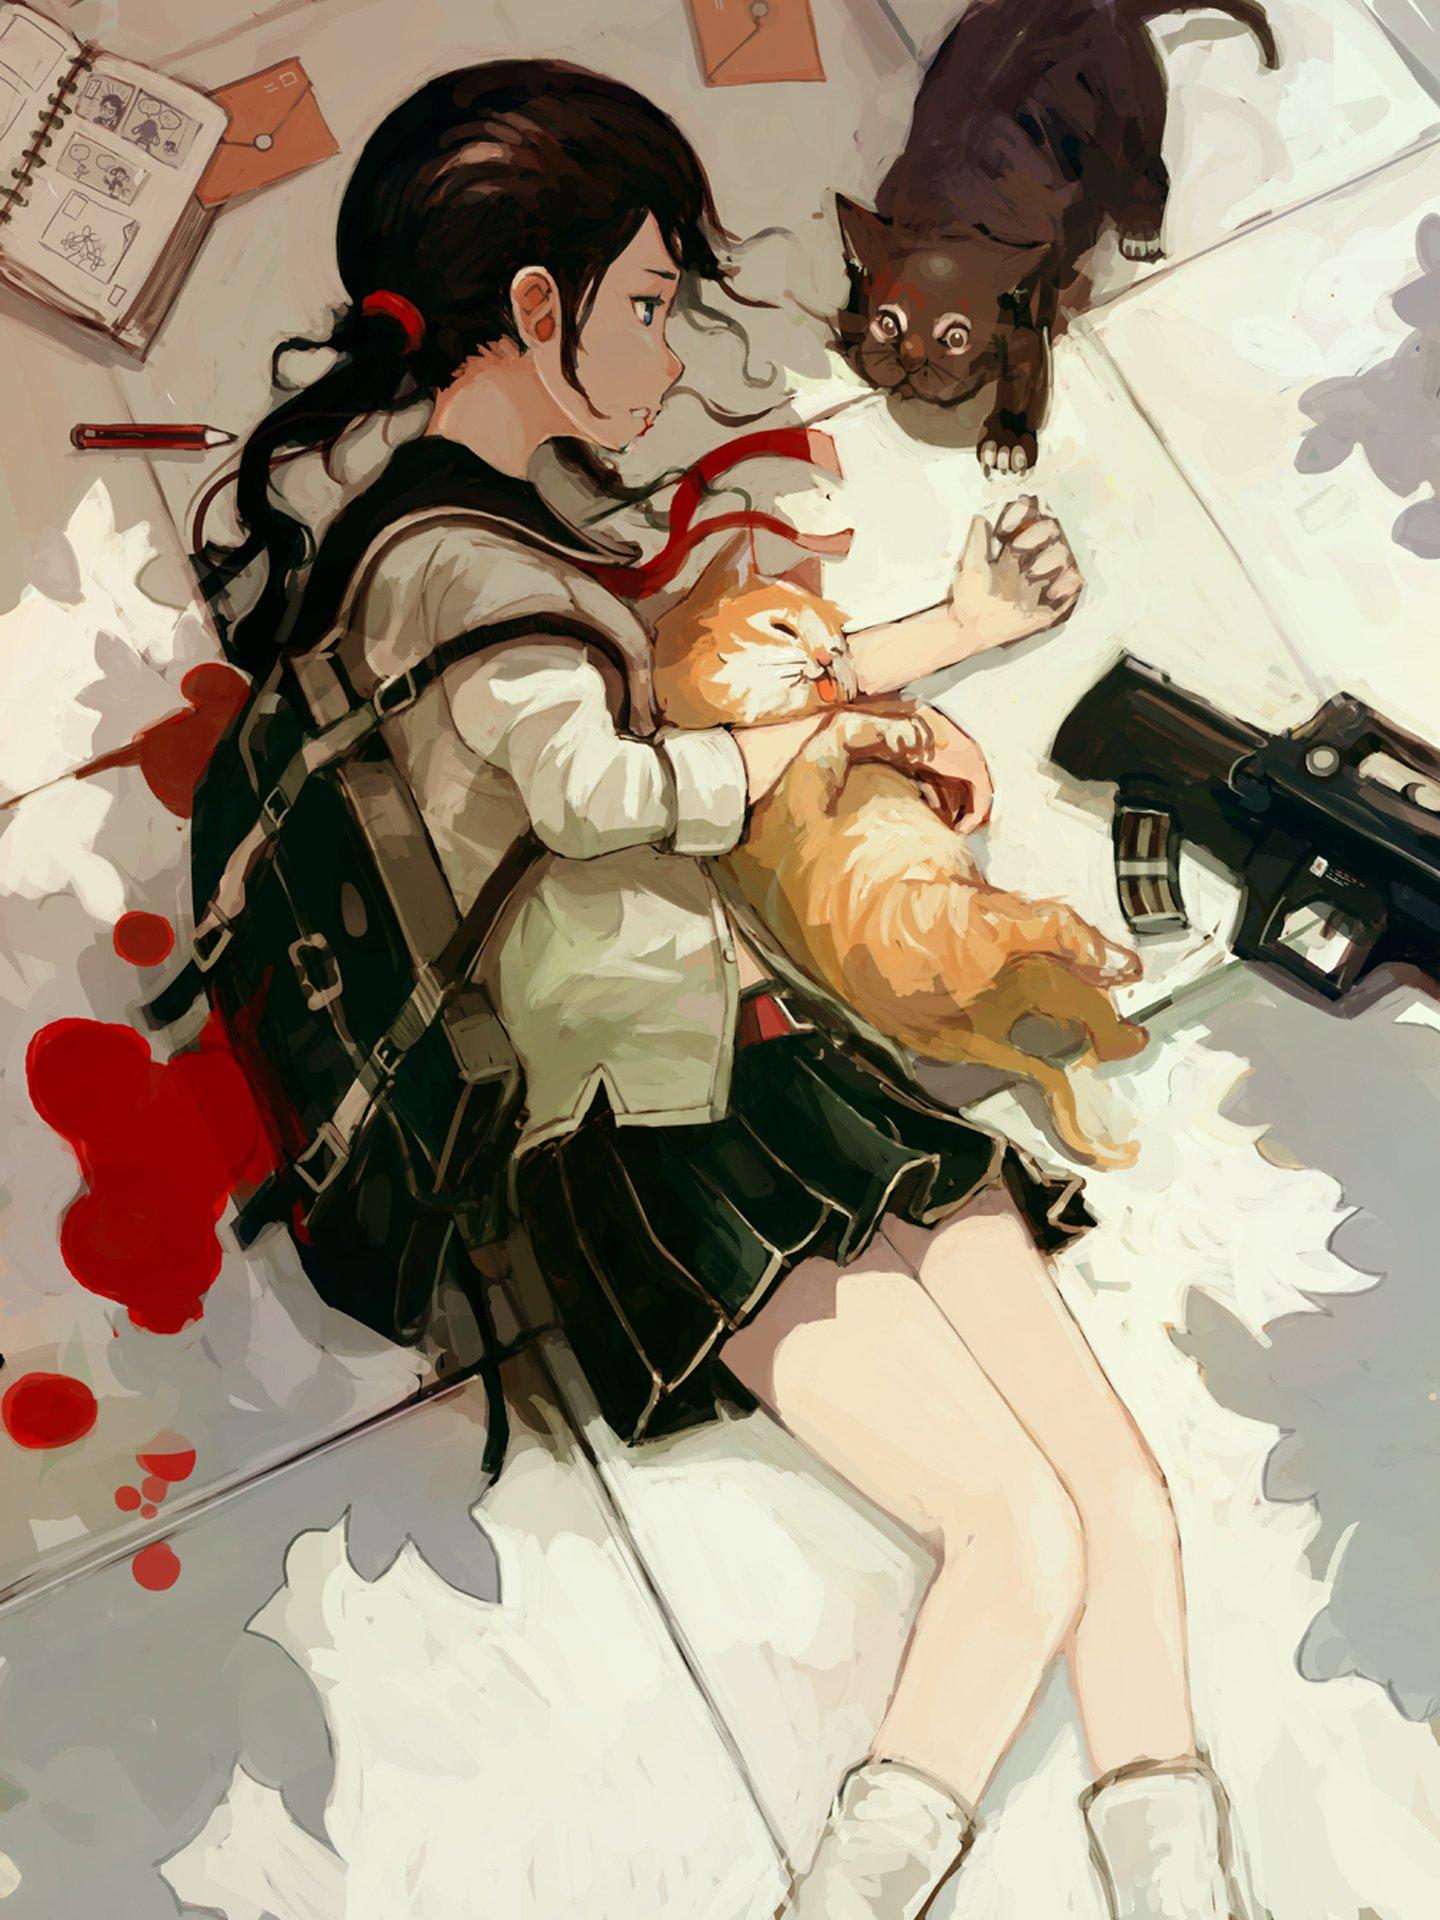 Anime Cute Girl Hoodie Wallpapers Anime Girl Cats Kitty Blood Book Pencil School Uniform